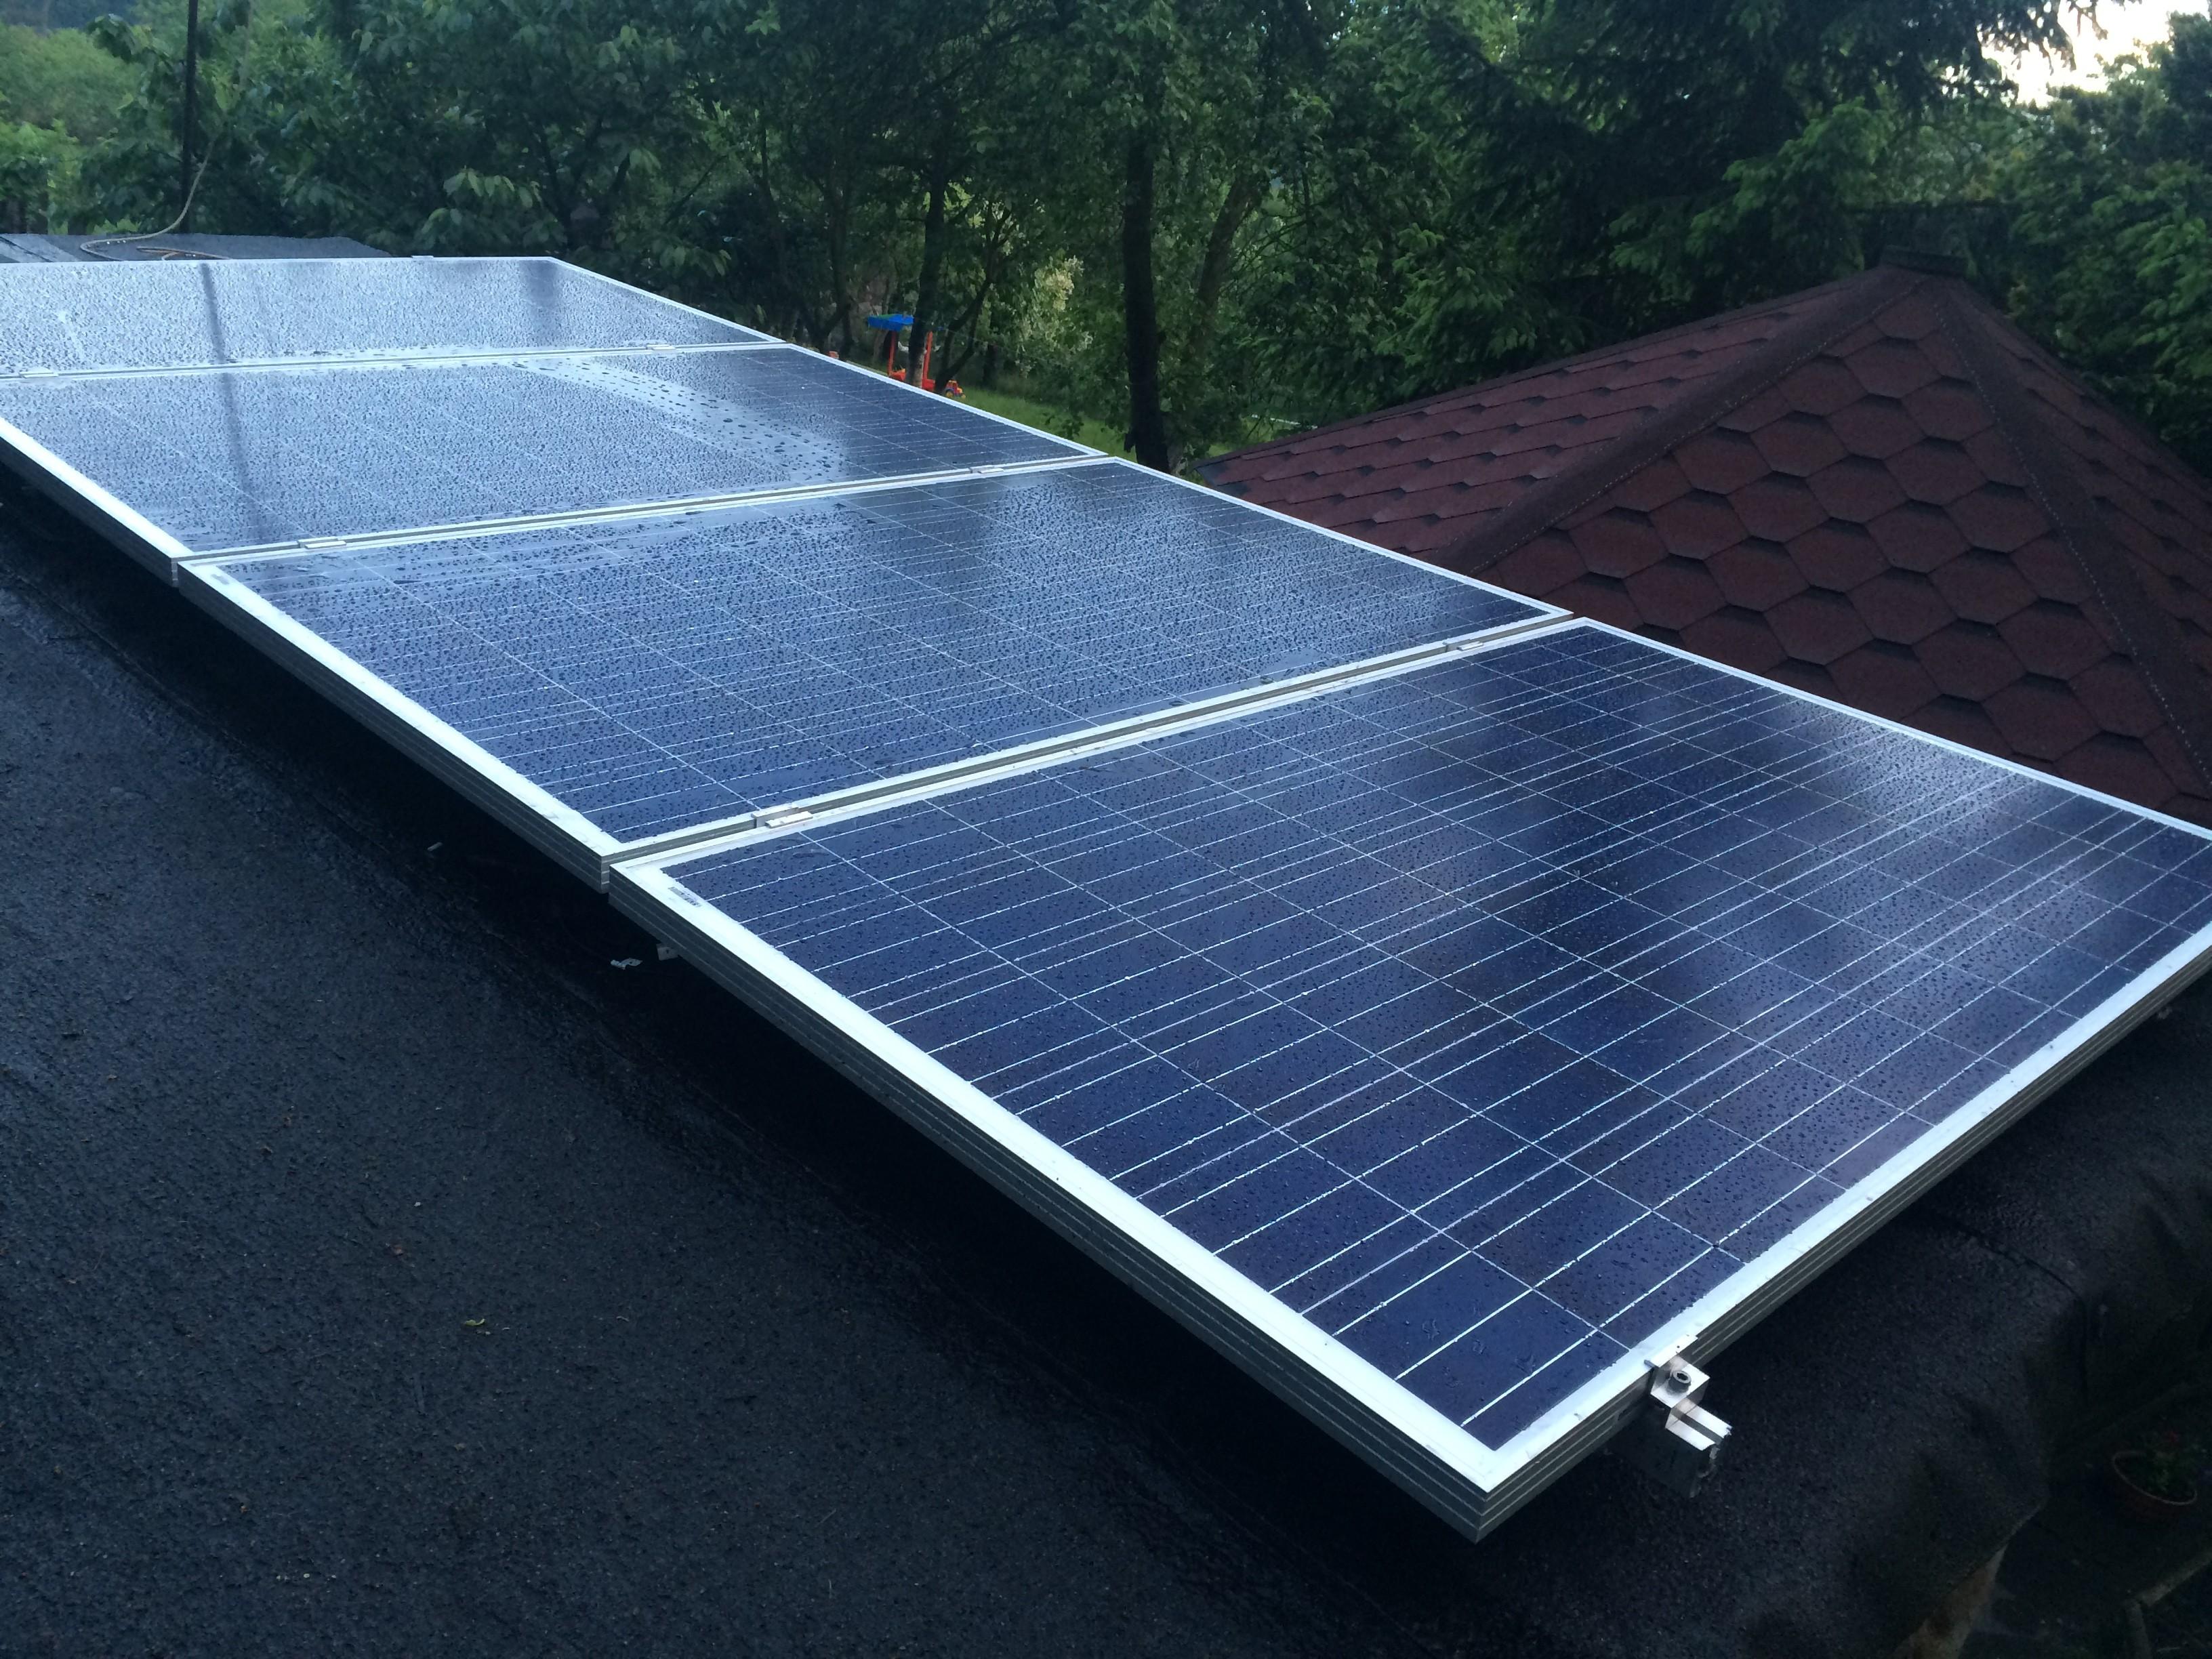 Zabrze - Moc 1 kWp Off-grid